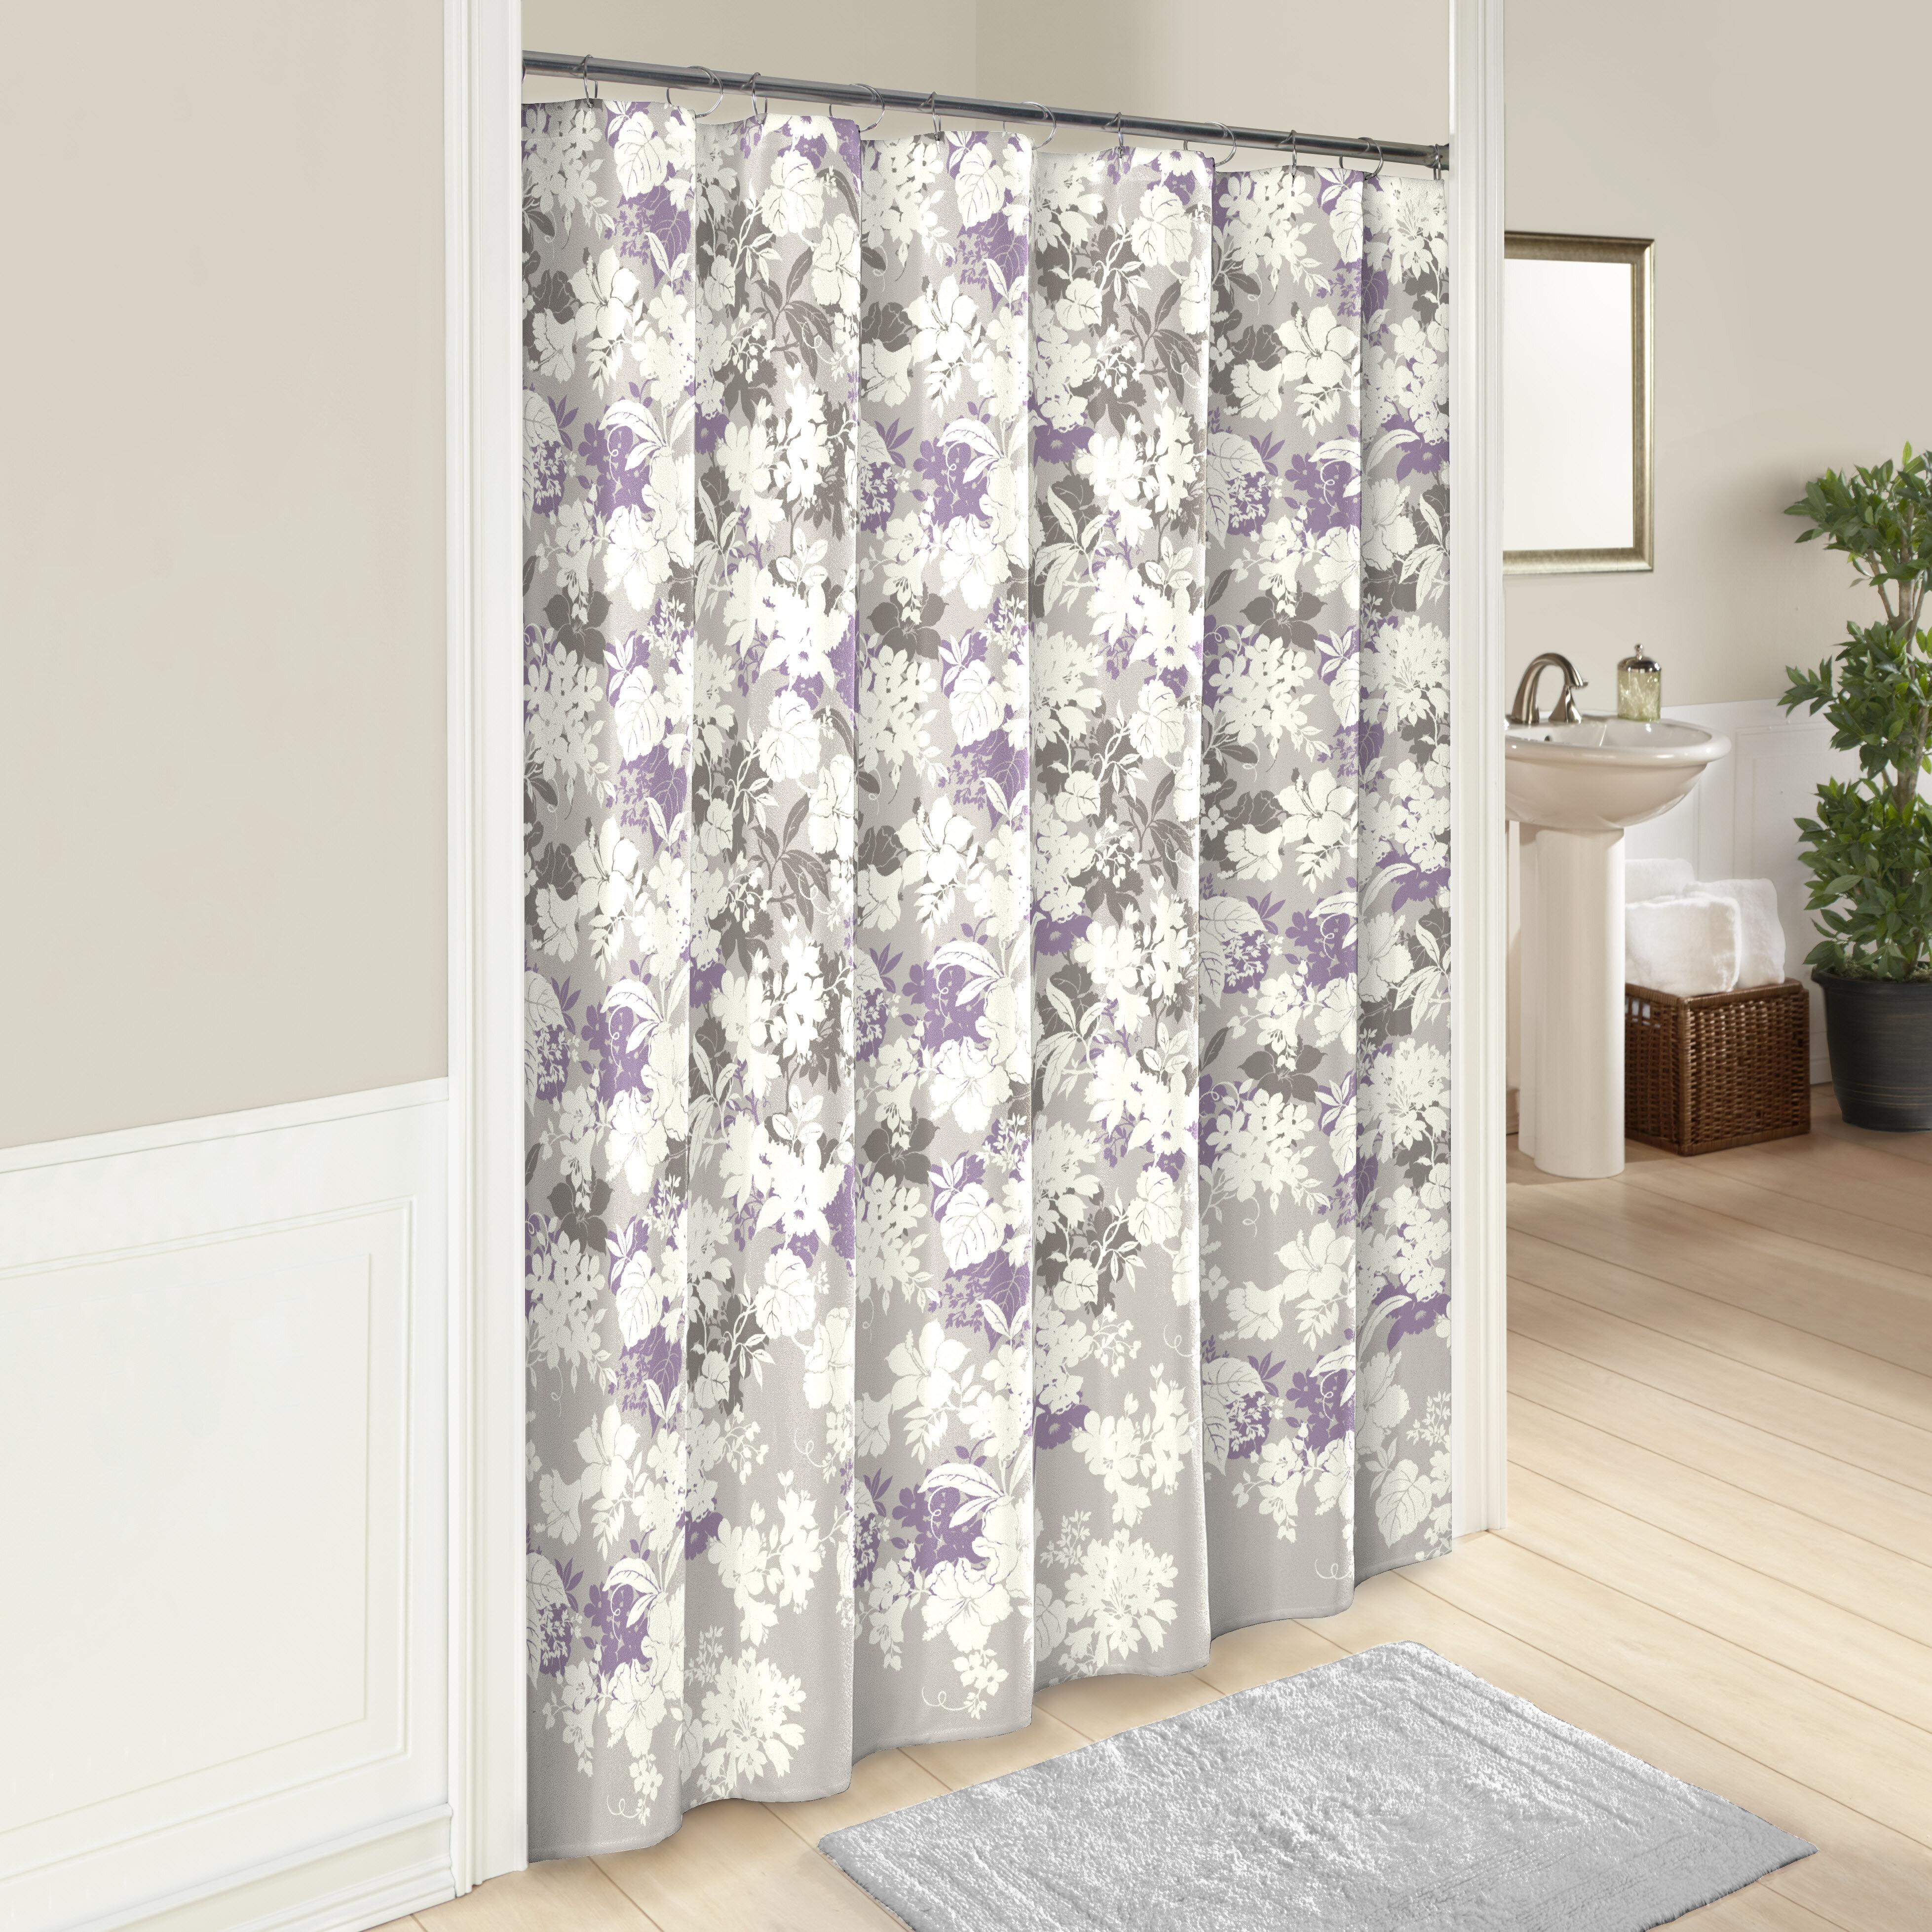 Vintage Set of 12 Purple Rose Floral Shower Curtain Hooks PRE-OWNED